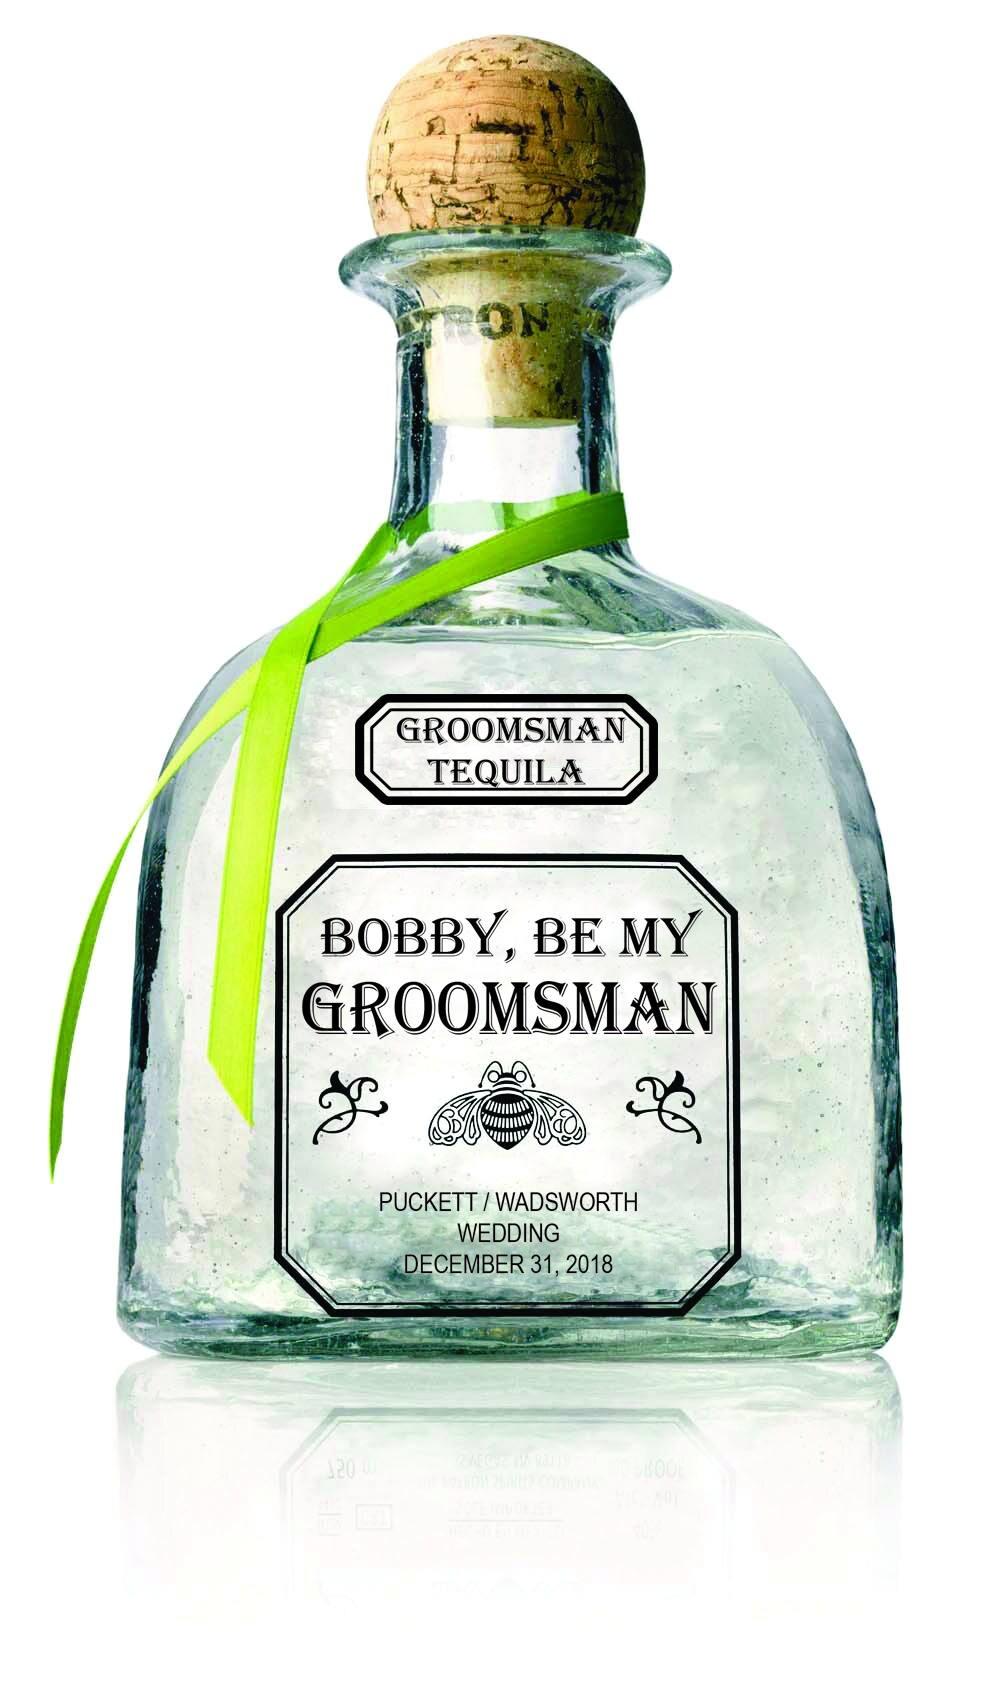 Groomsman Patron 750 or 375mL labels